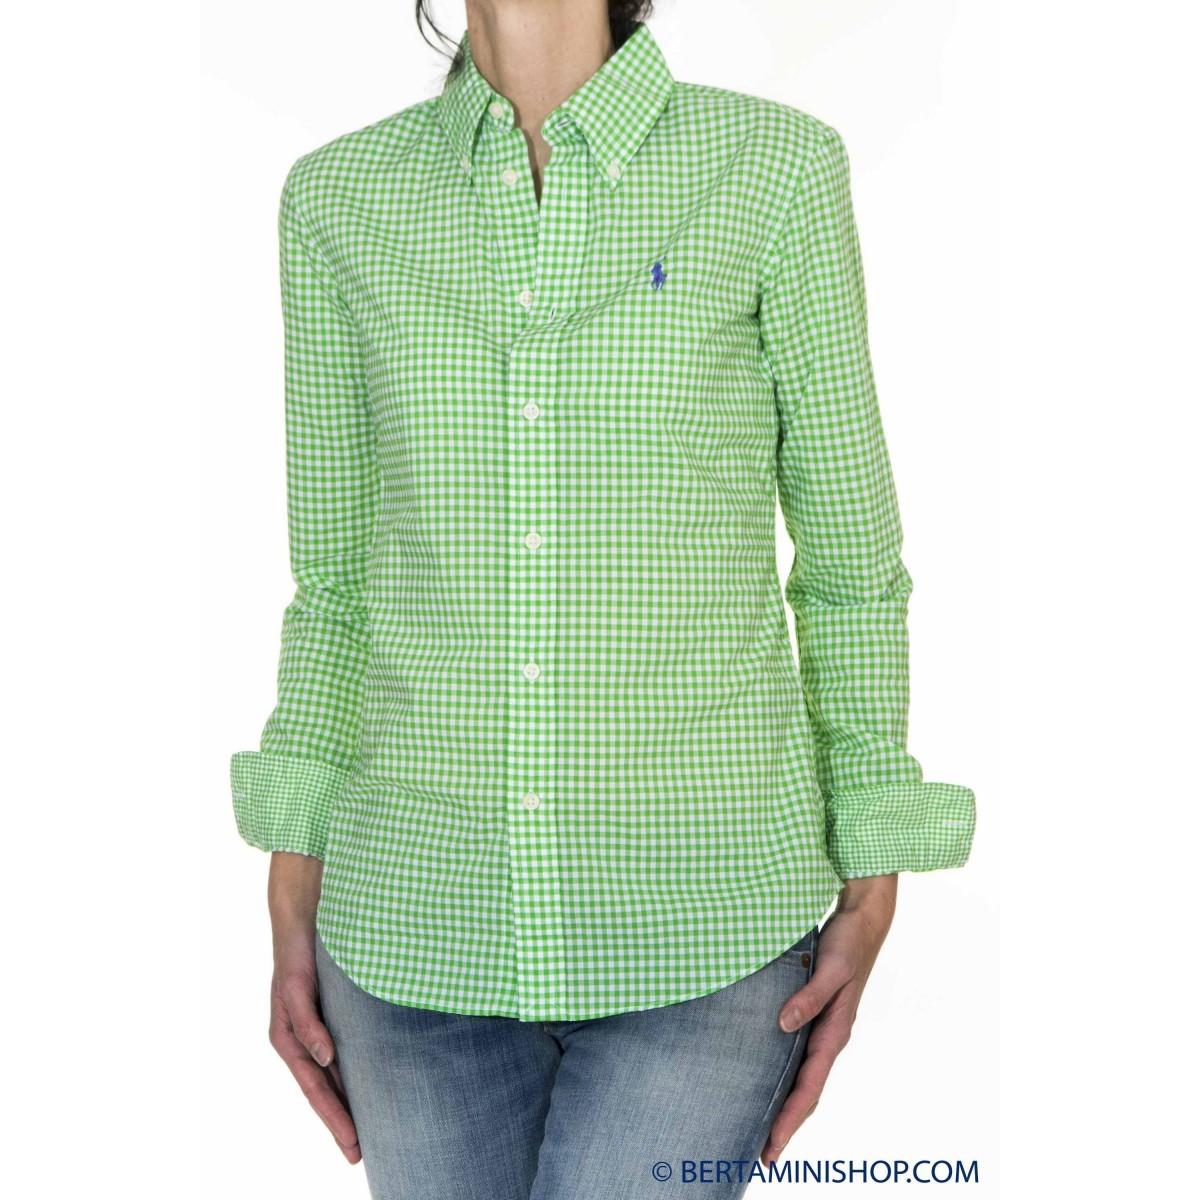 Camicia donna Ralph lauren - V33ih739vh739 cam quadro J3H01 - Verde